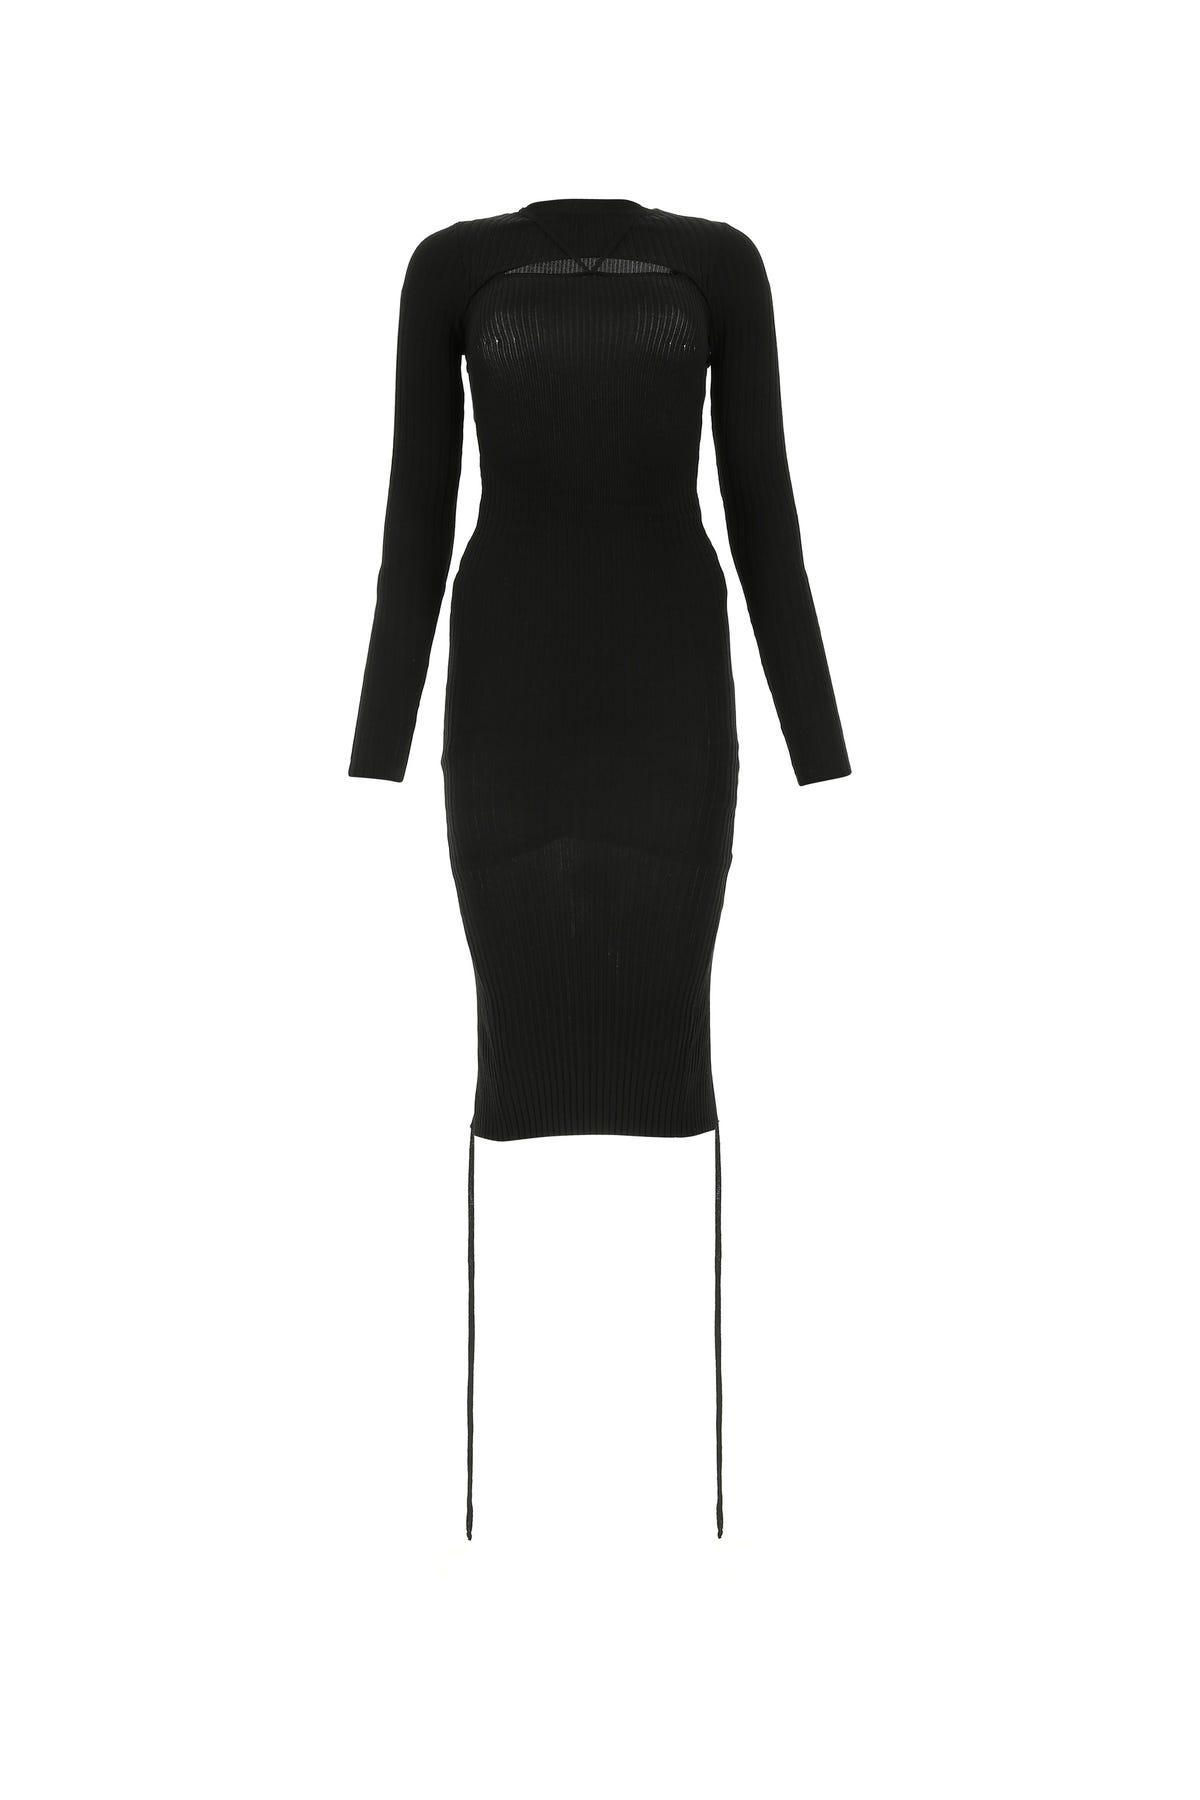 Adamo Black Stretch Viscose Blend Dress  Black  Donna Xs